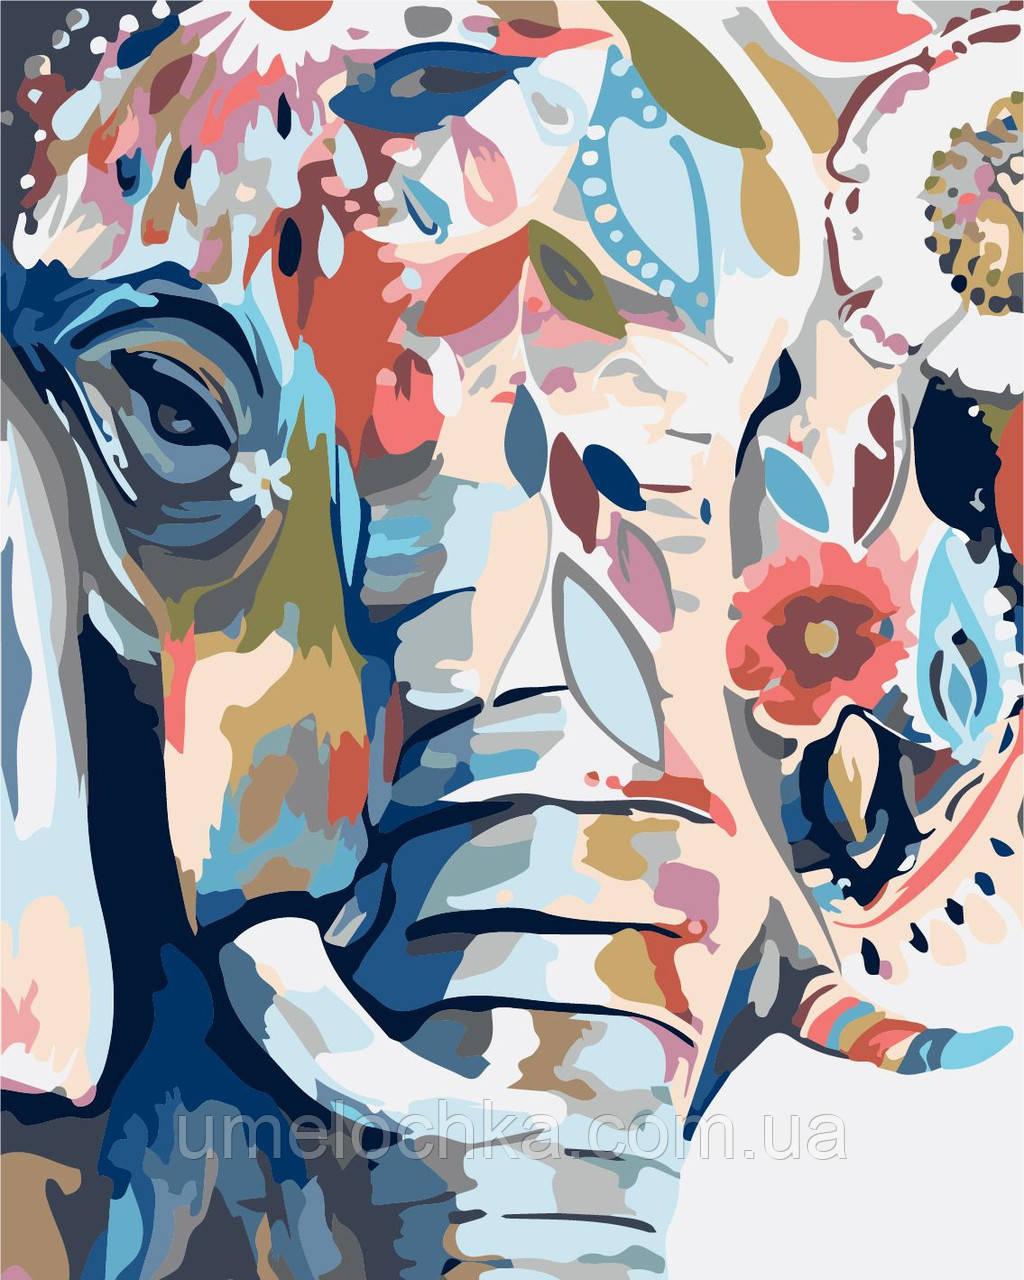 Картина по номерам без коробки Идейка Восточные краски (KHO2470) 40 х 50 см